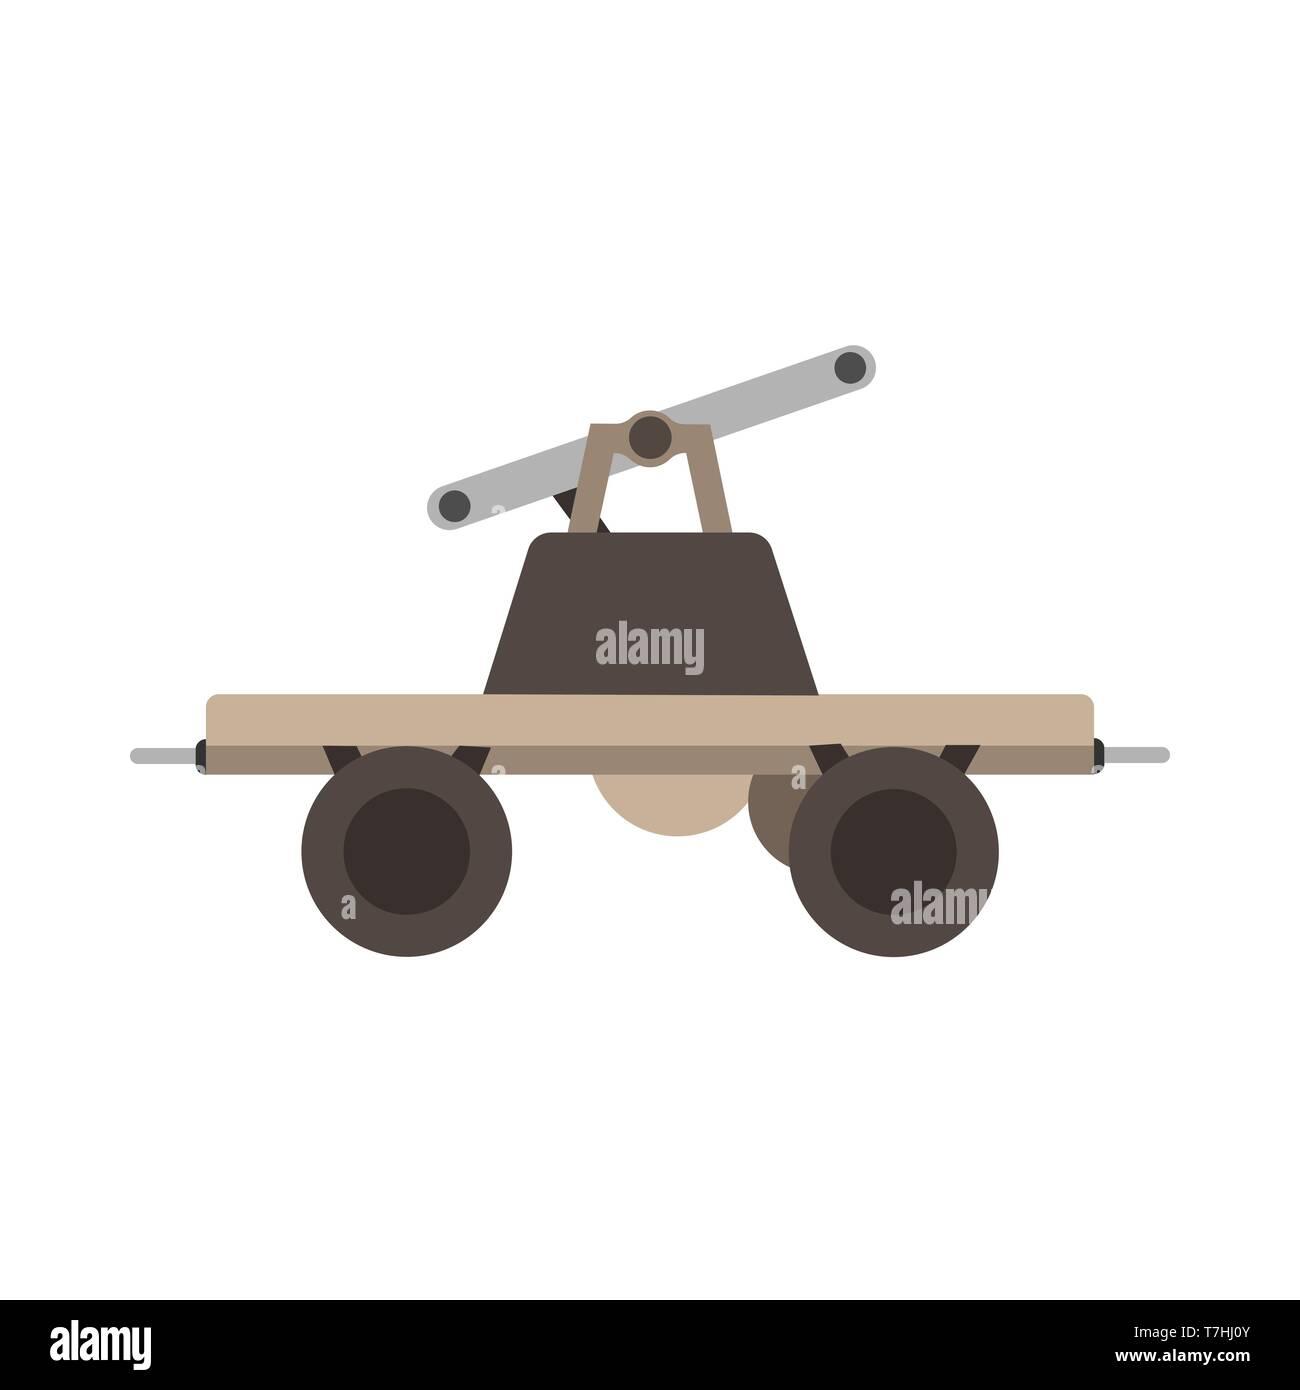 Draisine handcar railway bicycle transport. History railroad flat vehicle design maintenance technology wheel vector Stock Vector